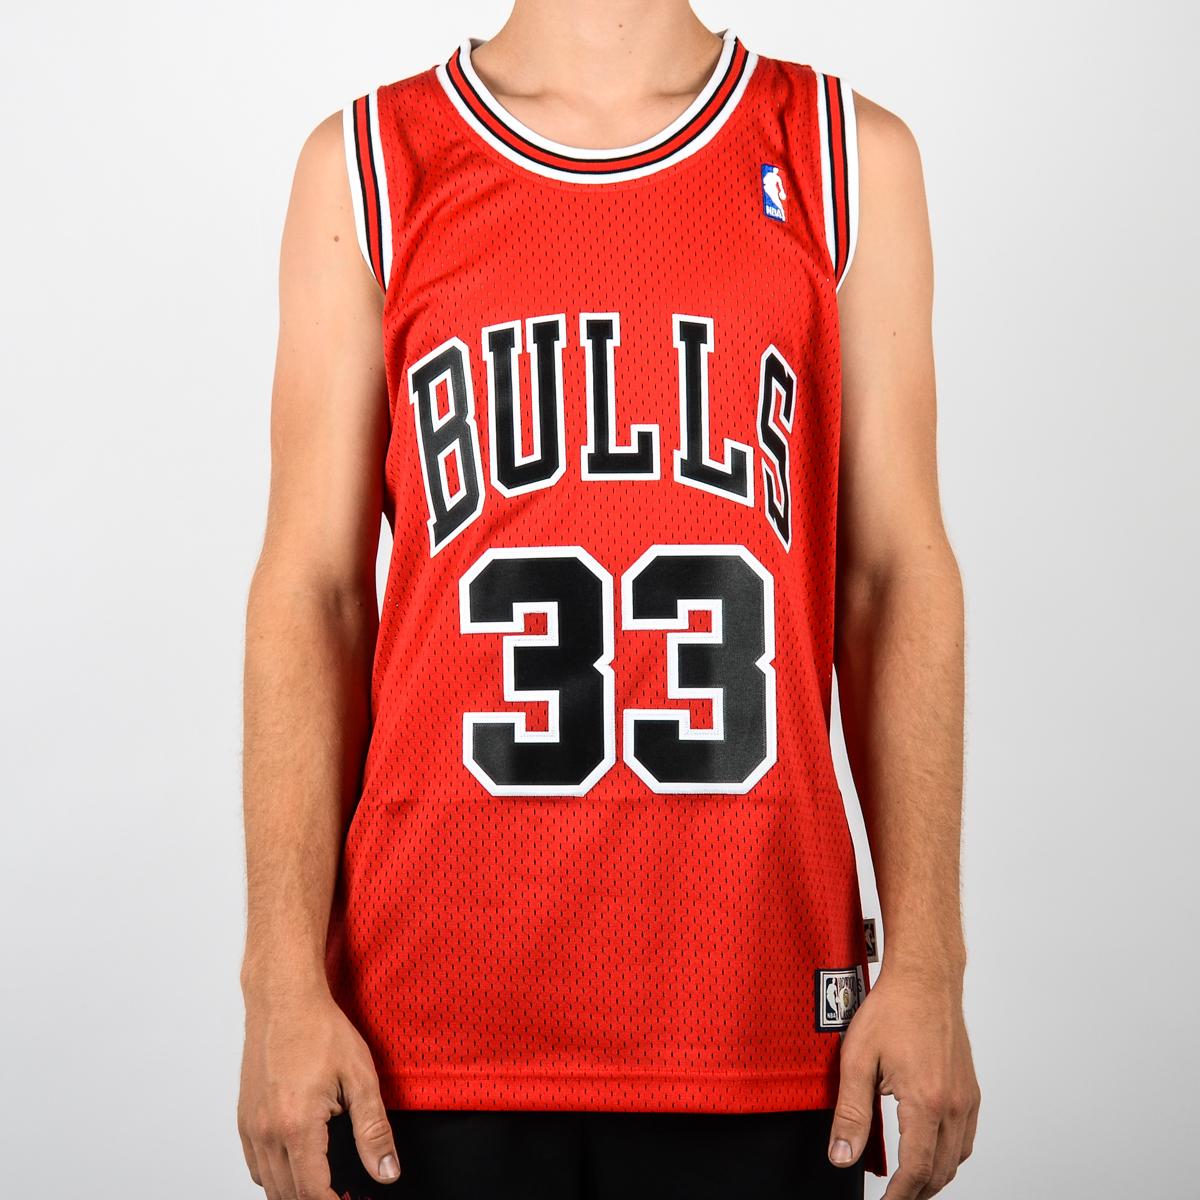 promo code 18205 c2e80 chicago bulls 33 scottie pippen white swingman jersey